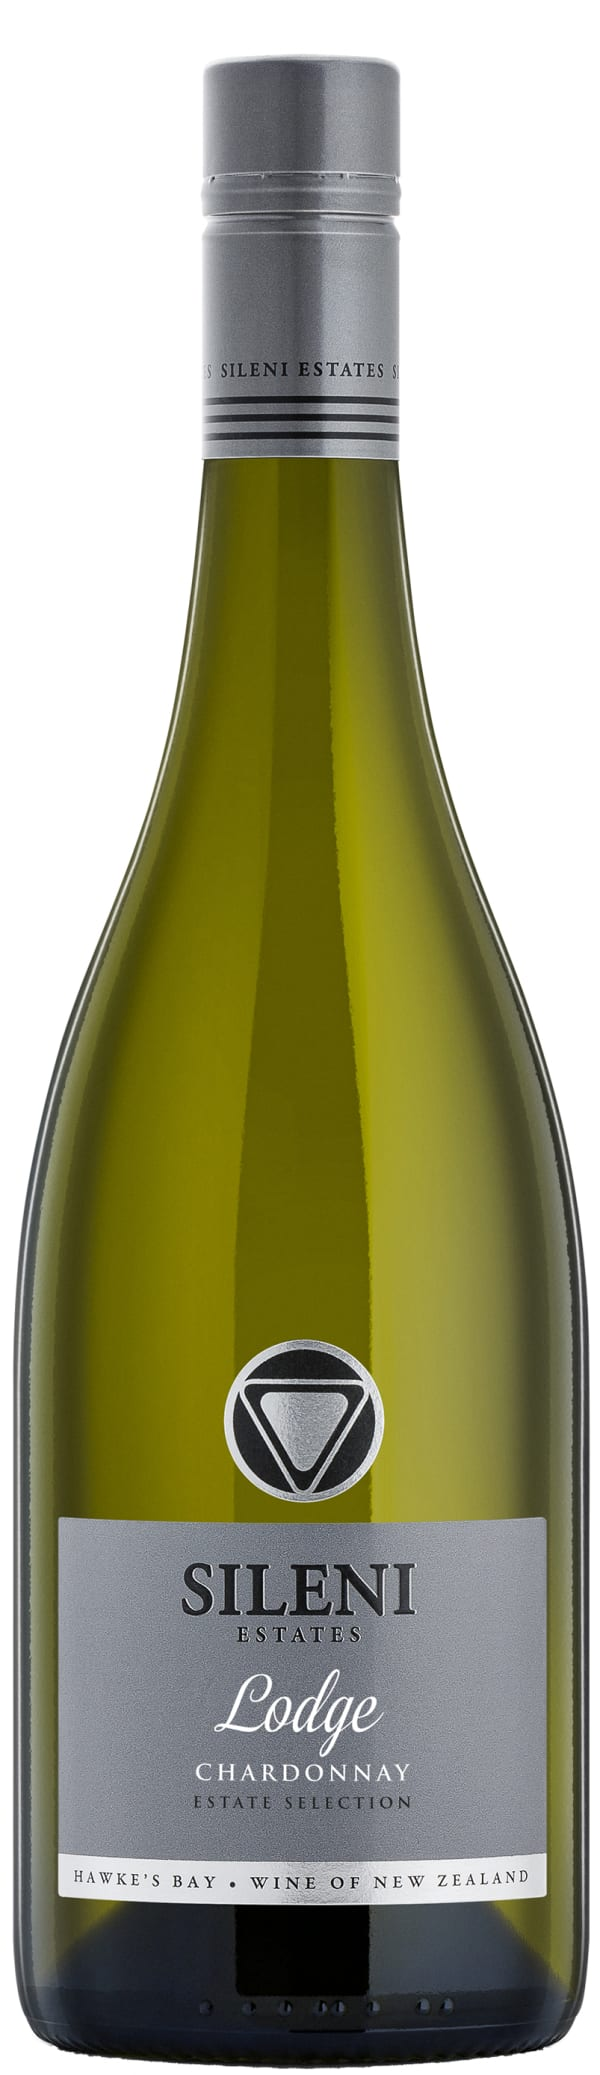 Sileni The Lodge Chardonnay 2016